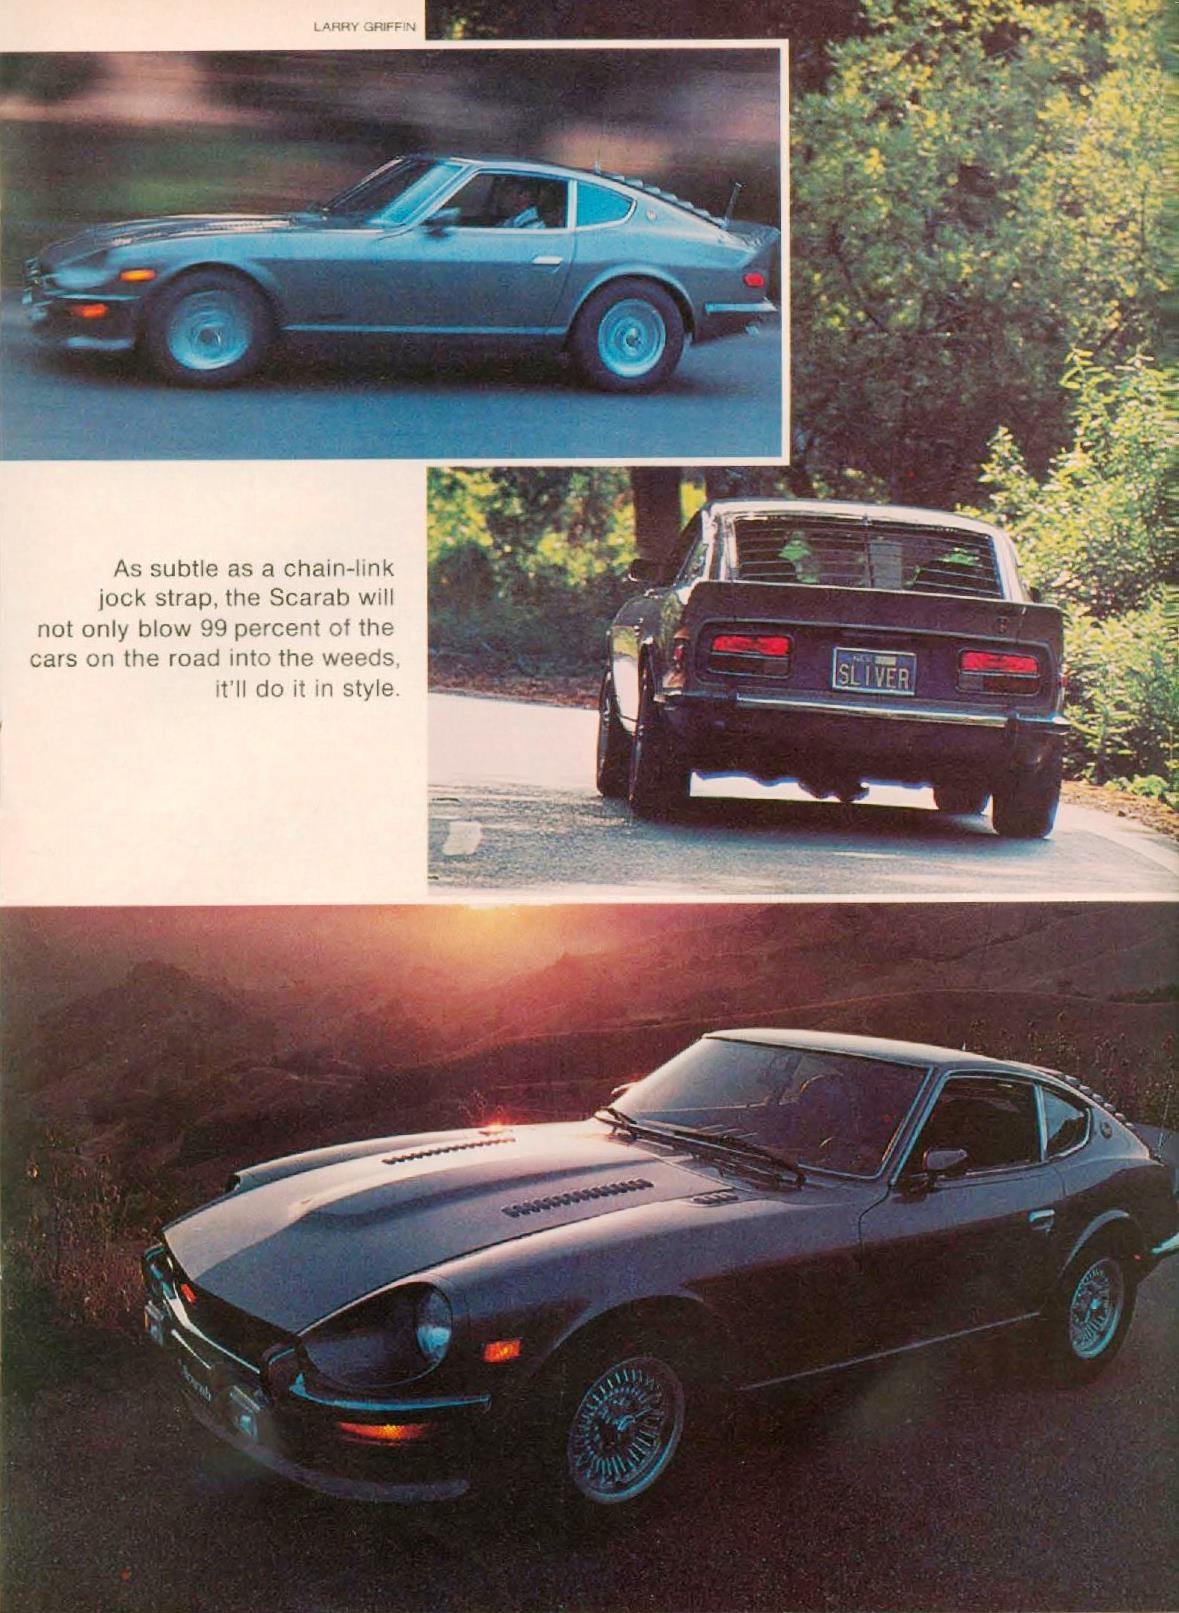 The Scarab legend - The original hybrid Datsun Z